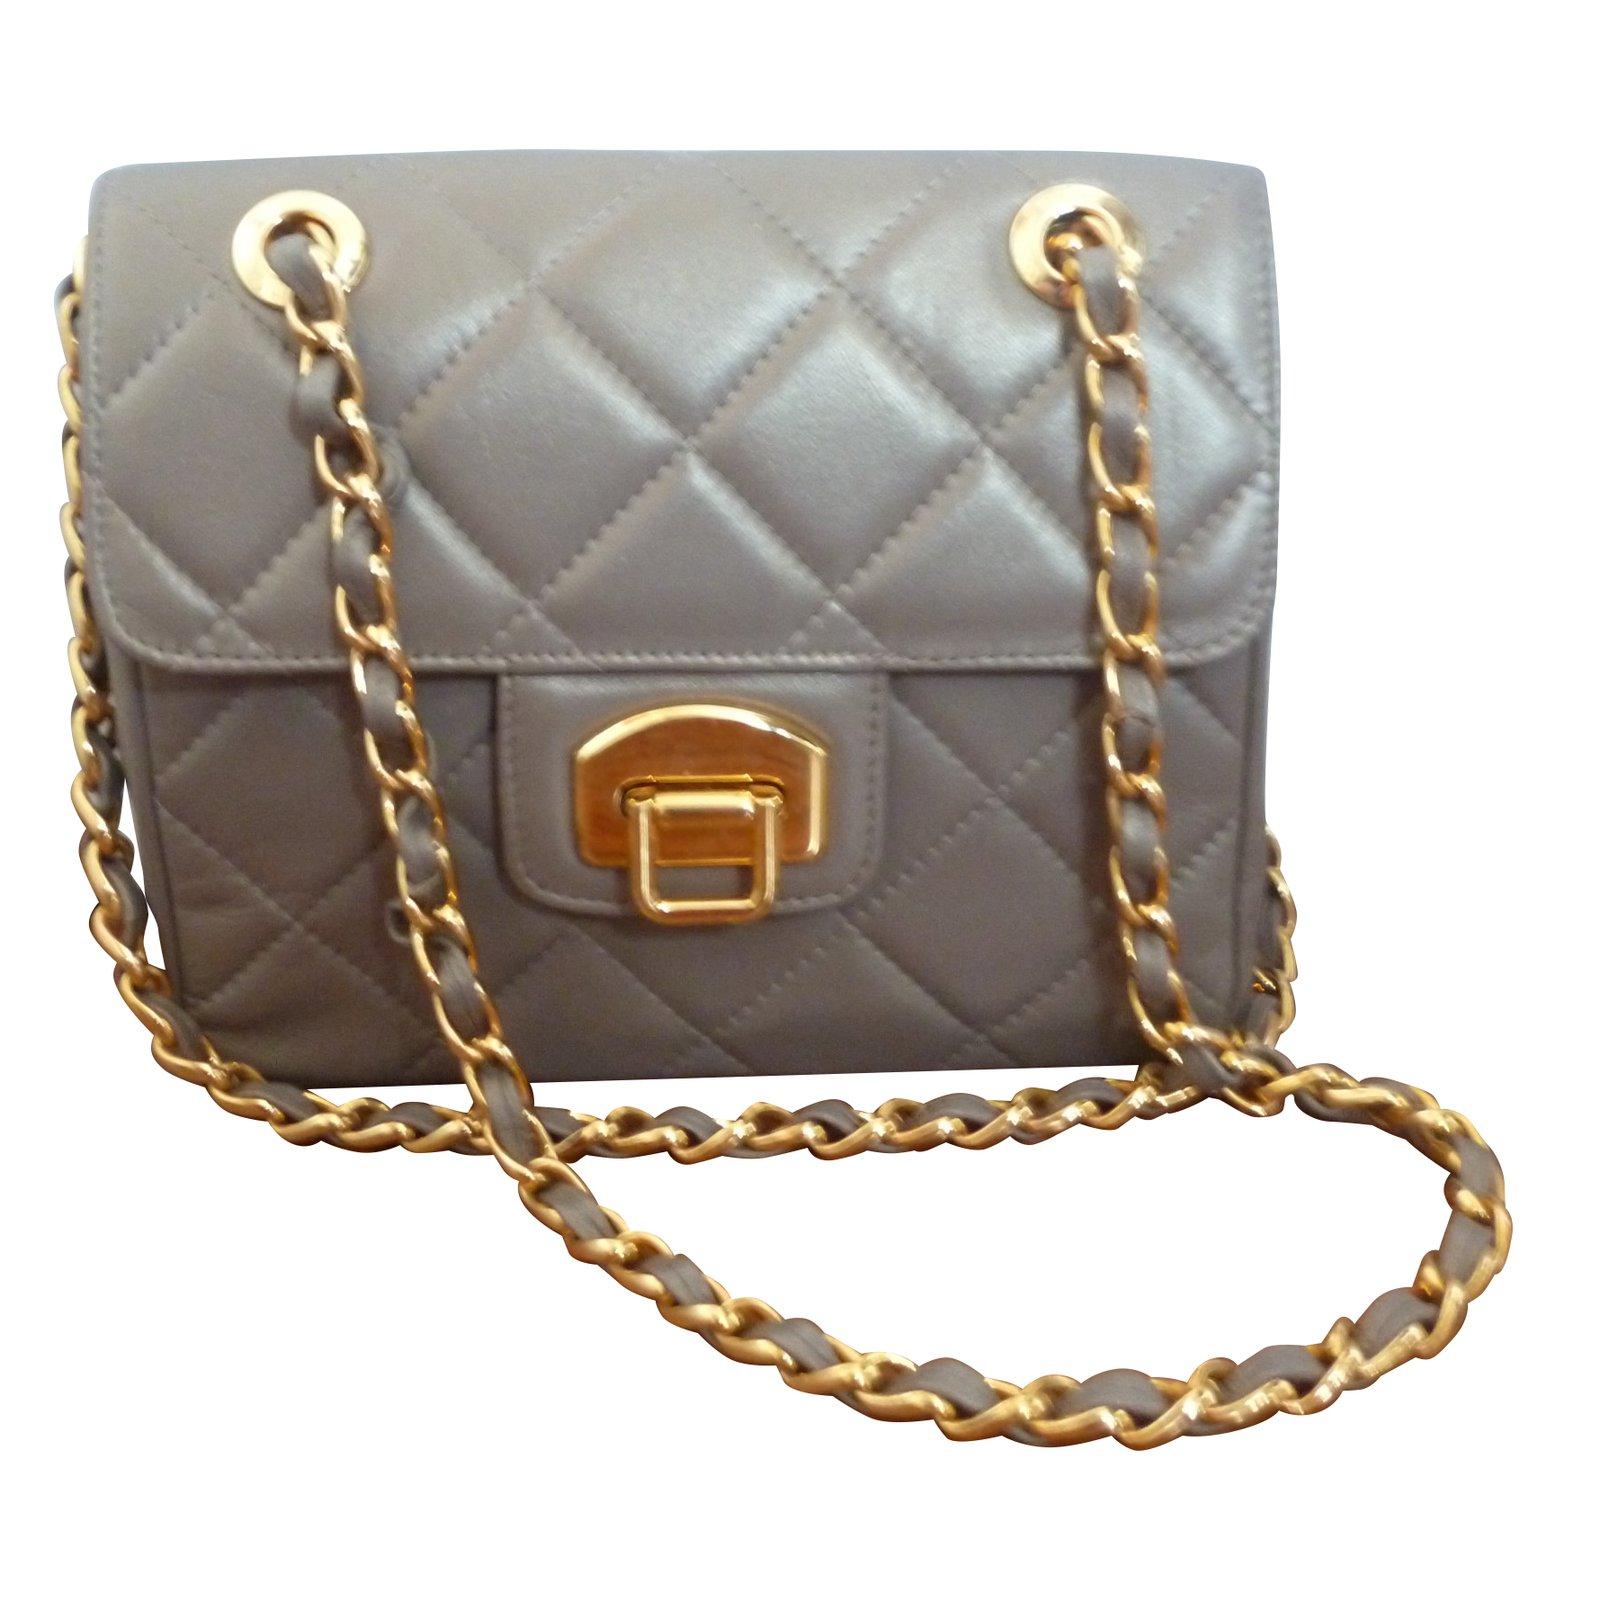 Charles Jourdan Handbags Leather Grey Ref 51664